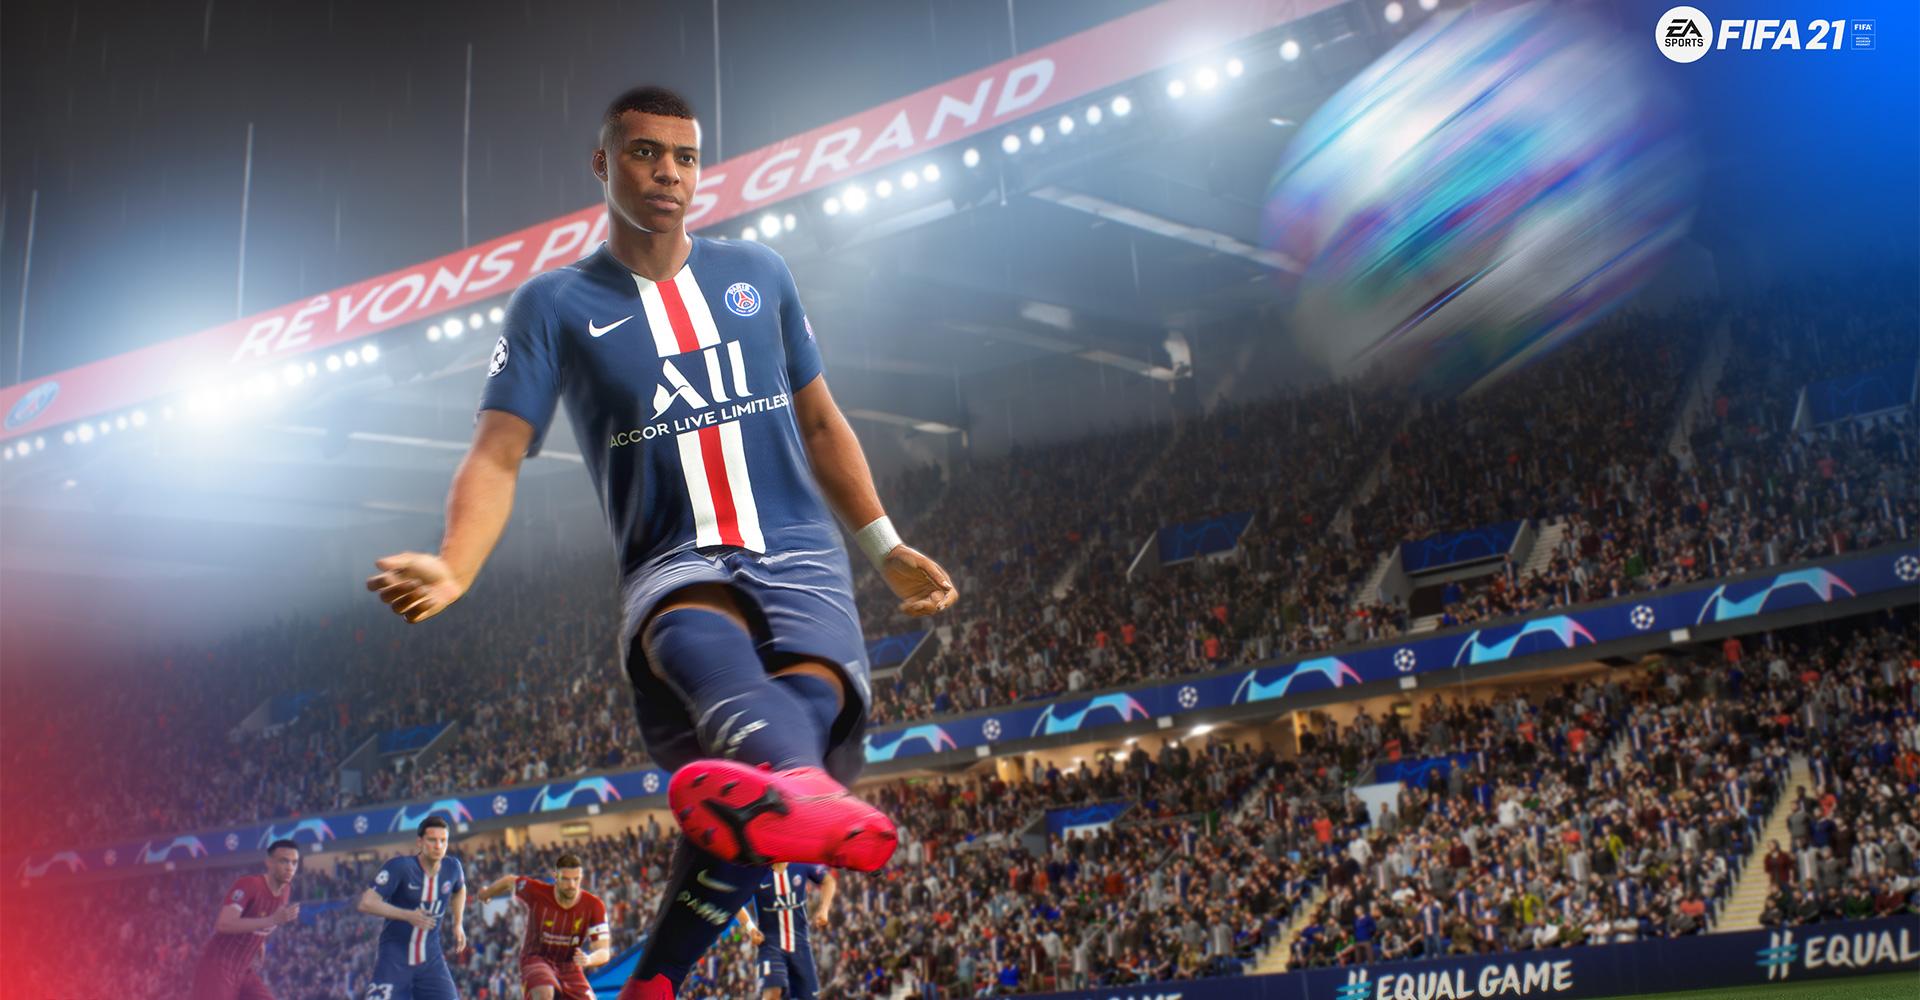 Kylian Mbappé in FIFA 21